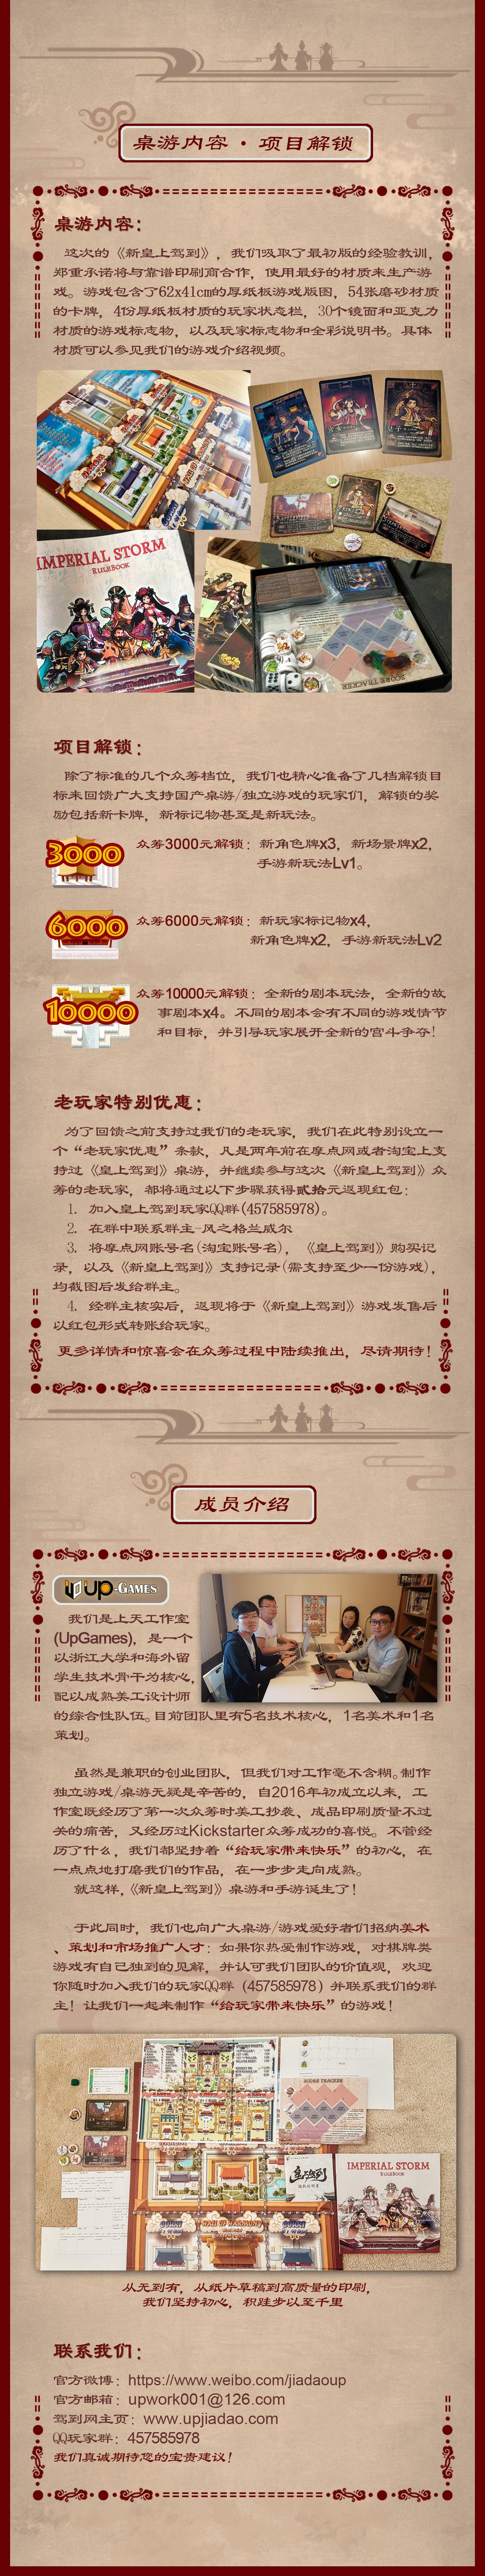 new竖版大宣传-中文-part3-10-13.jpg